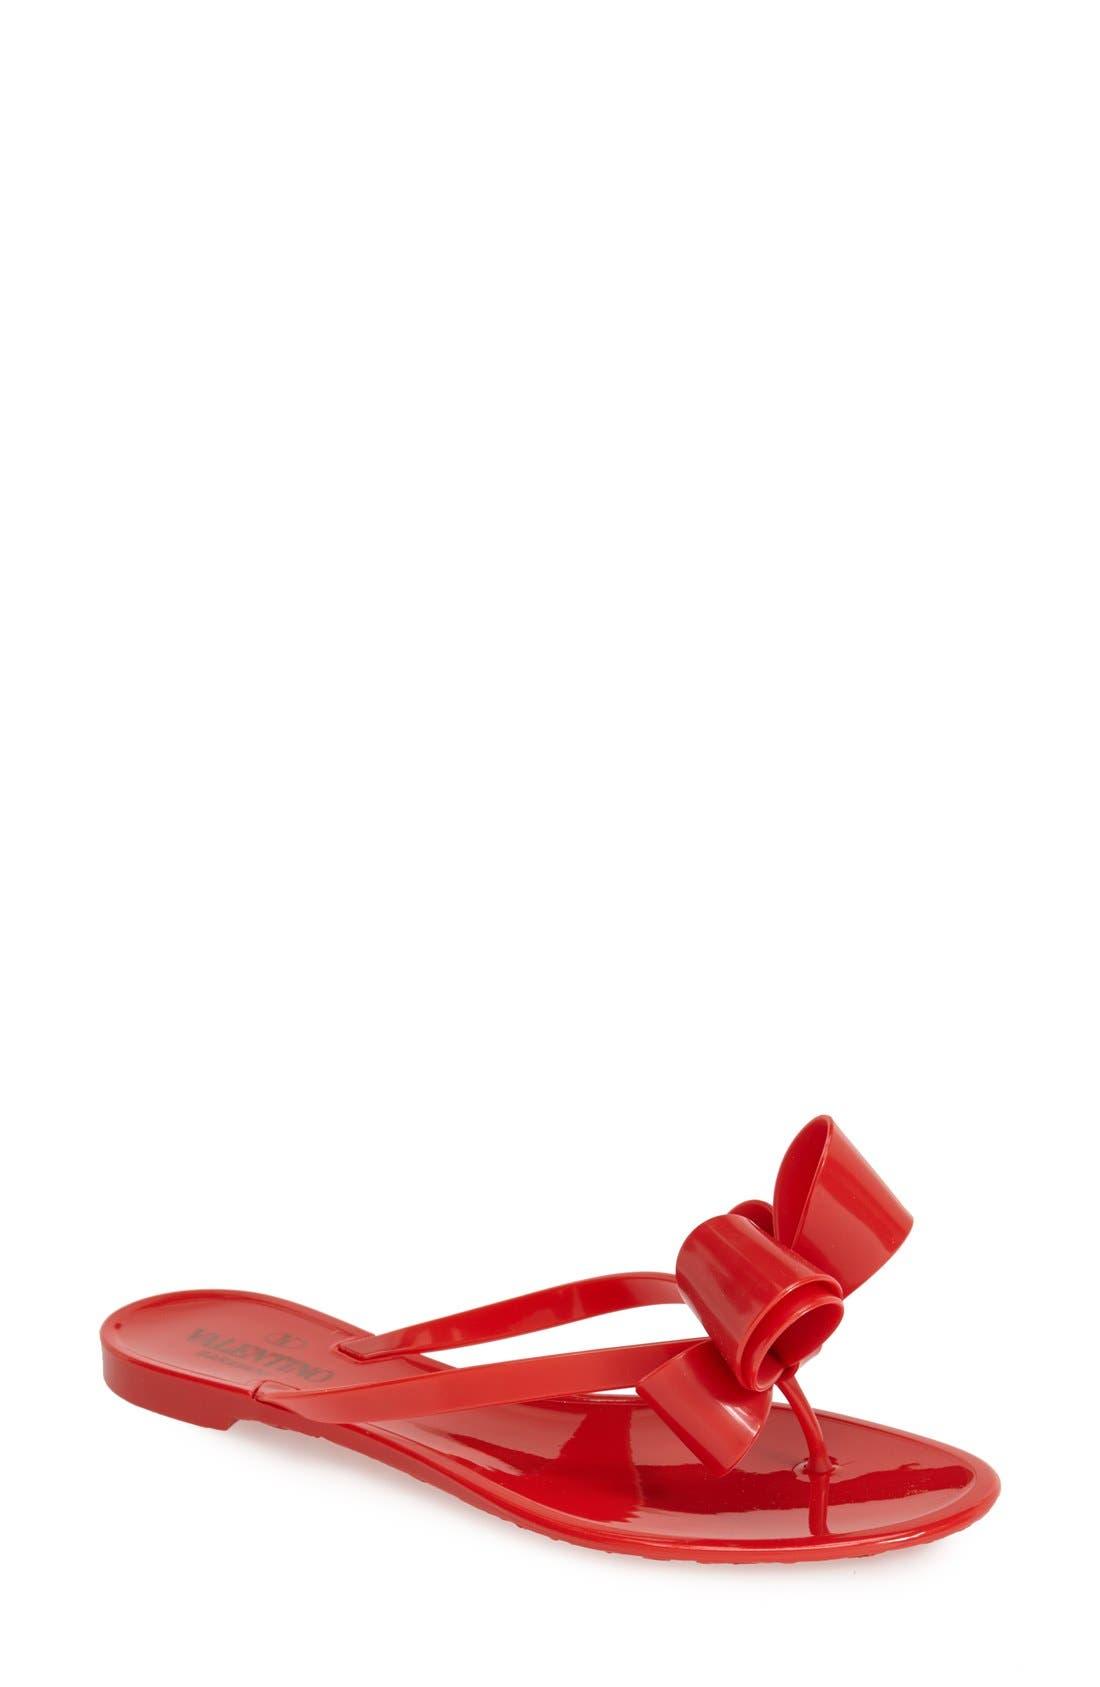 Main Image - VALENTINO GARAVANI Couture Bow Thong Sandal (Women)